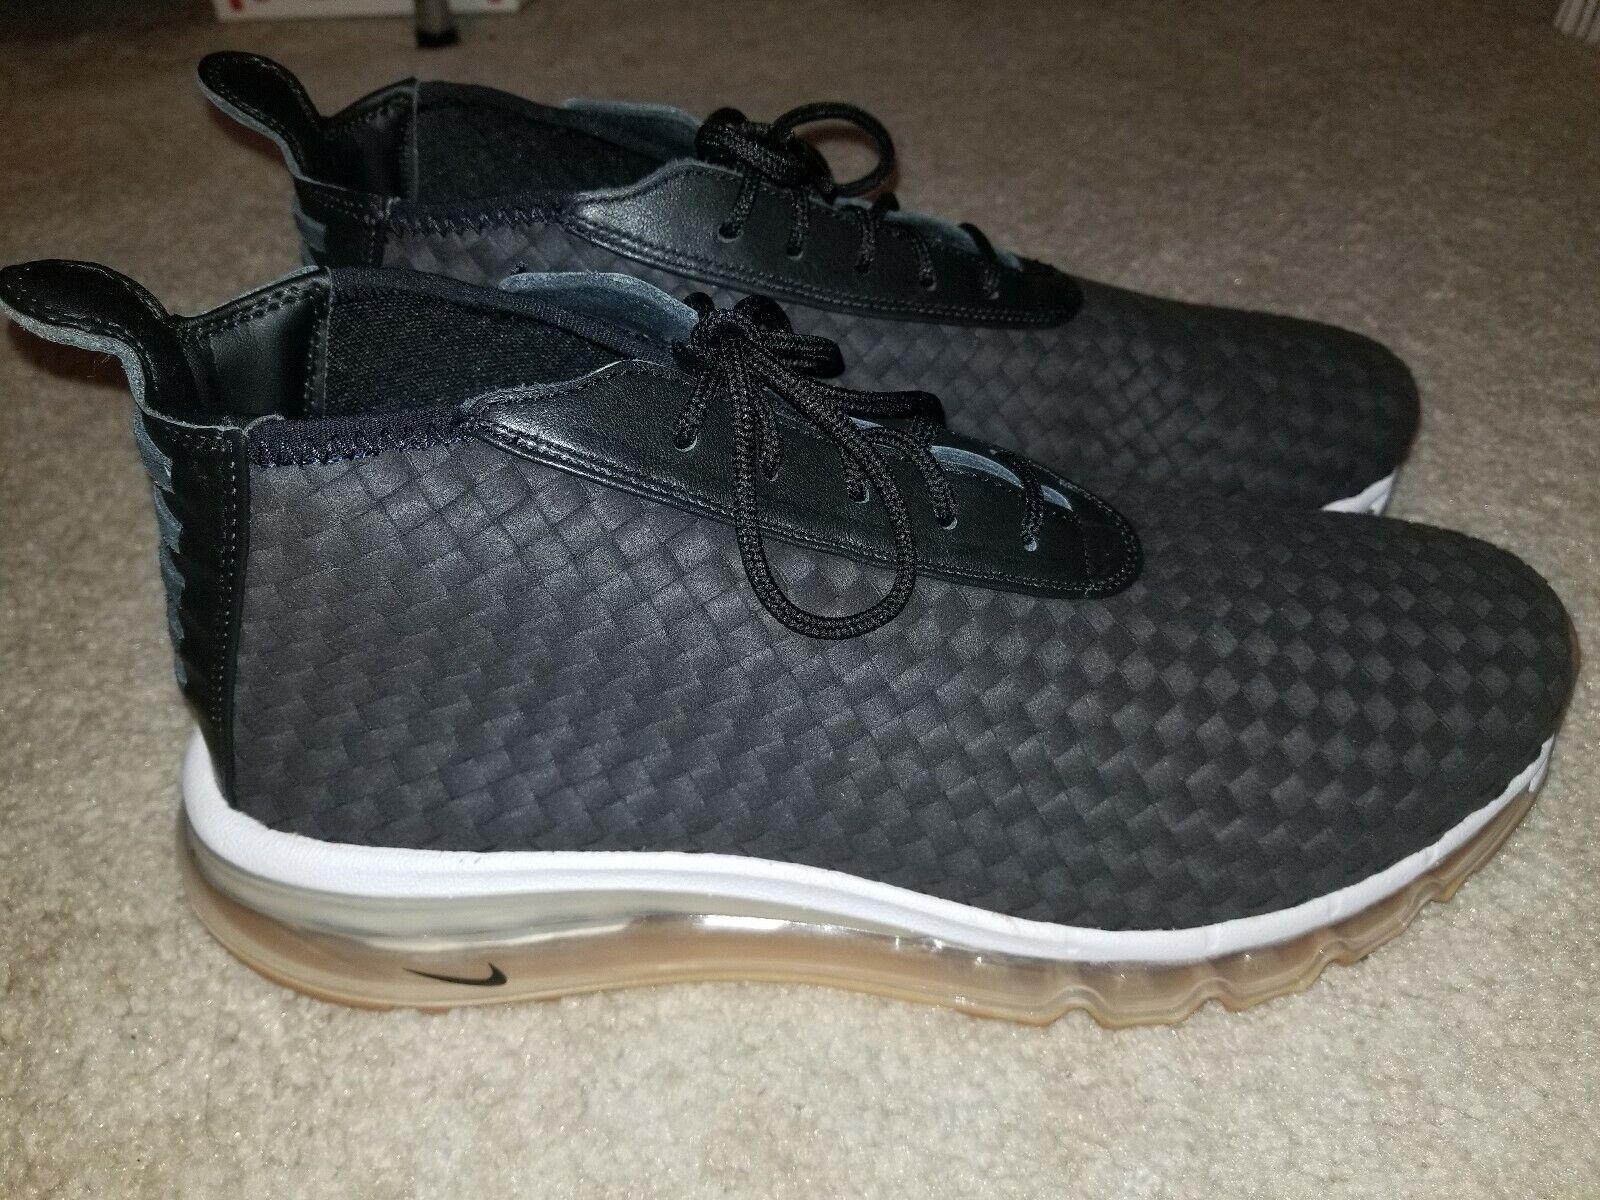 New Sz 11.5 Nike NikeLab Air Max Woven Sneaker Boot Black White Gum 921854-003